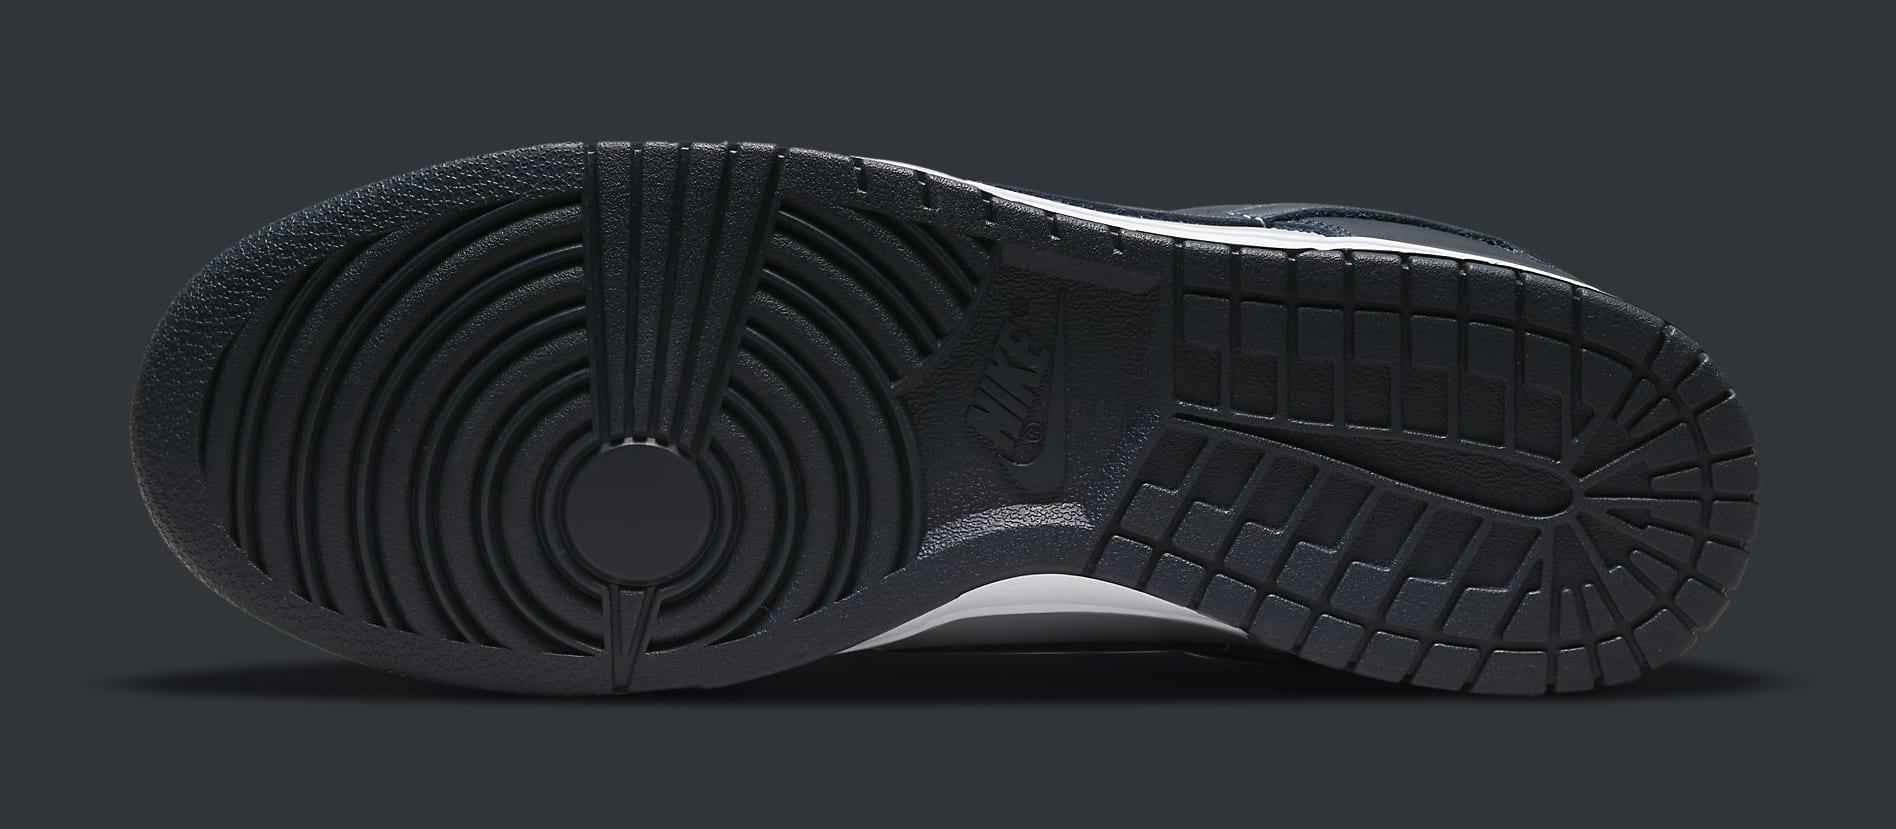 Nike Dunk Low 'Georgetown' DD1391-003 Outsole